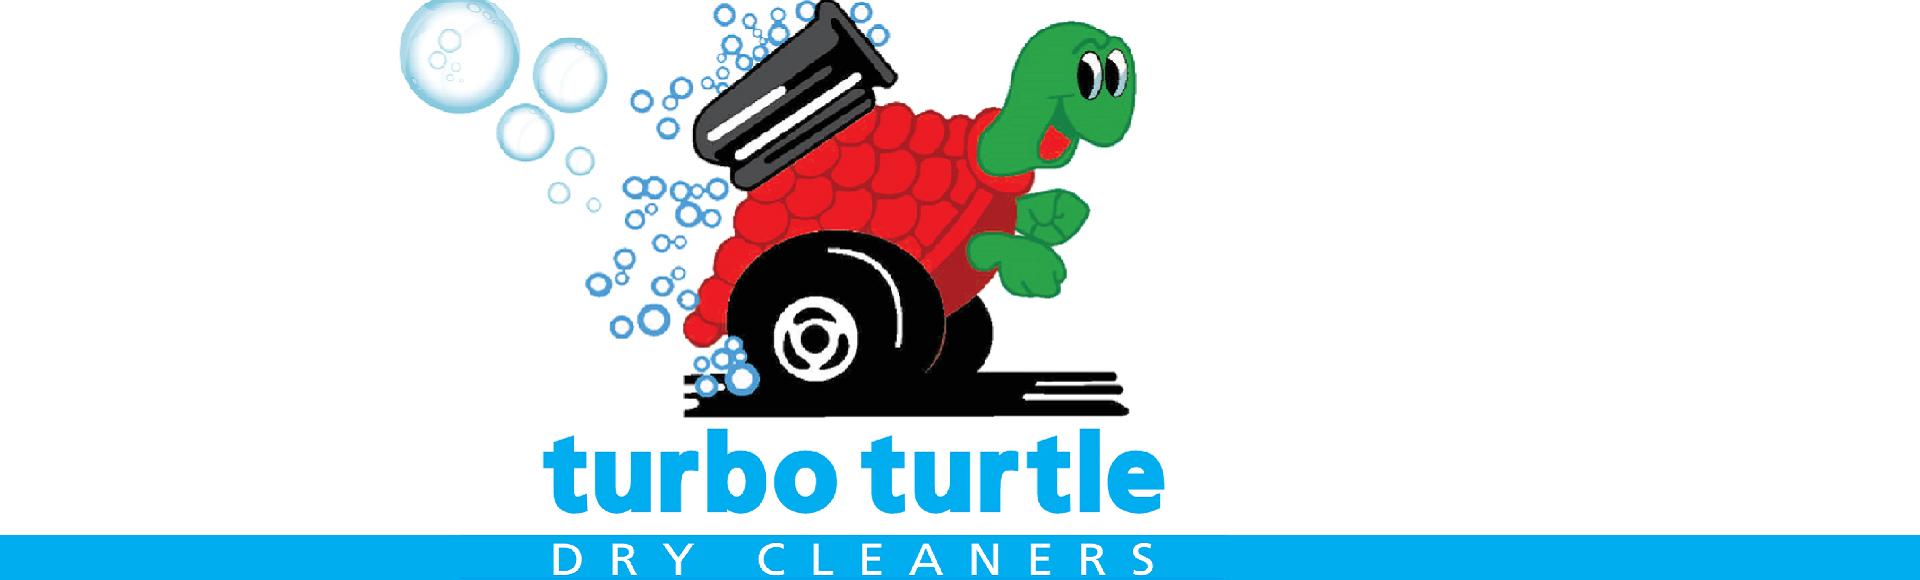 turbo turtle 264a